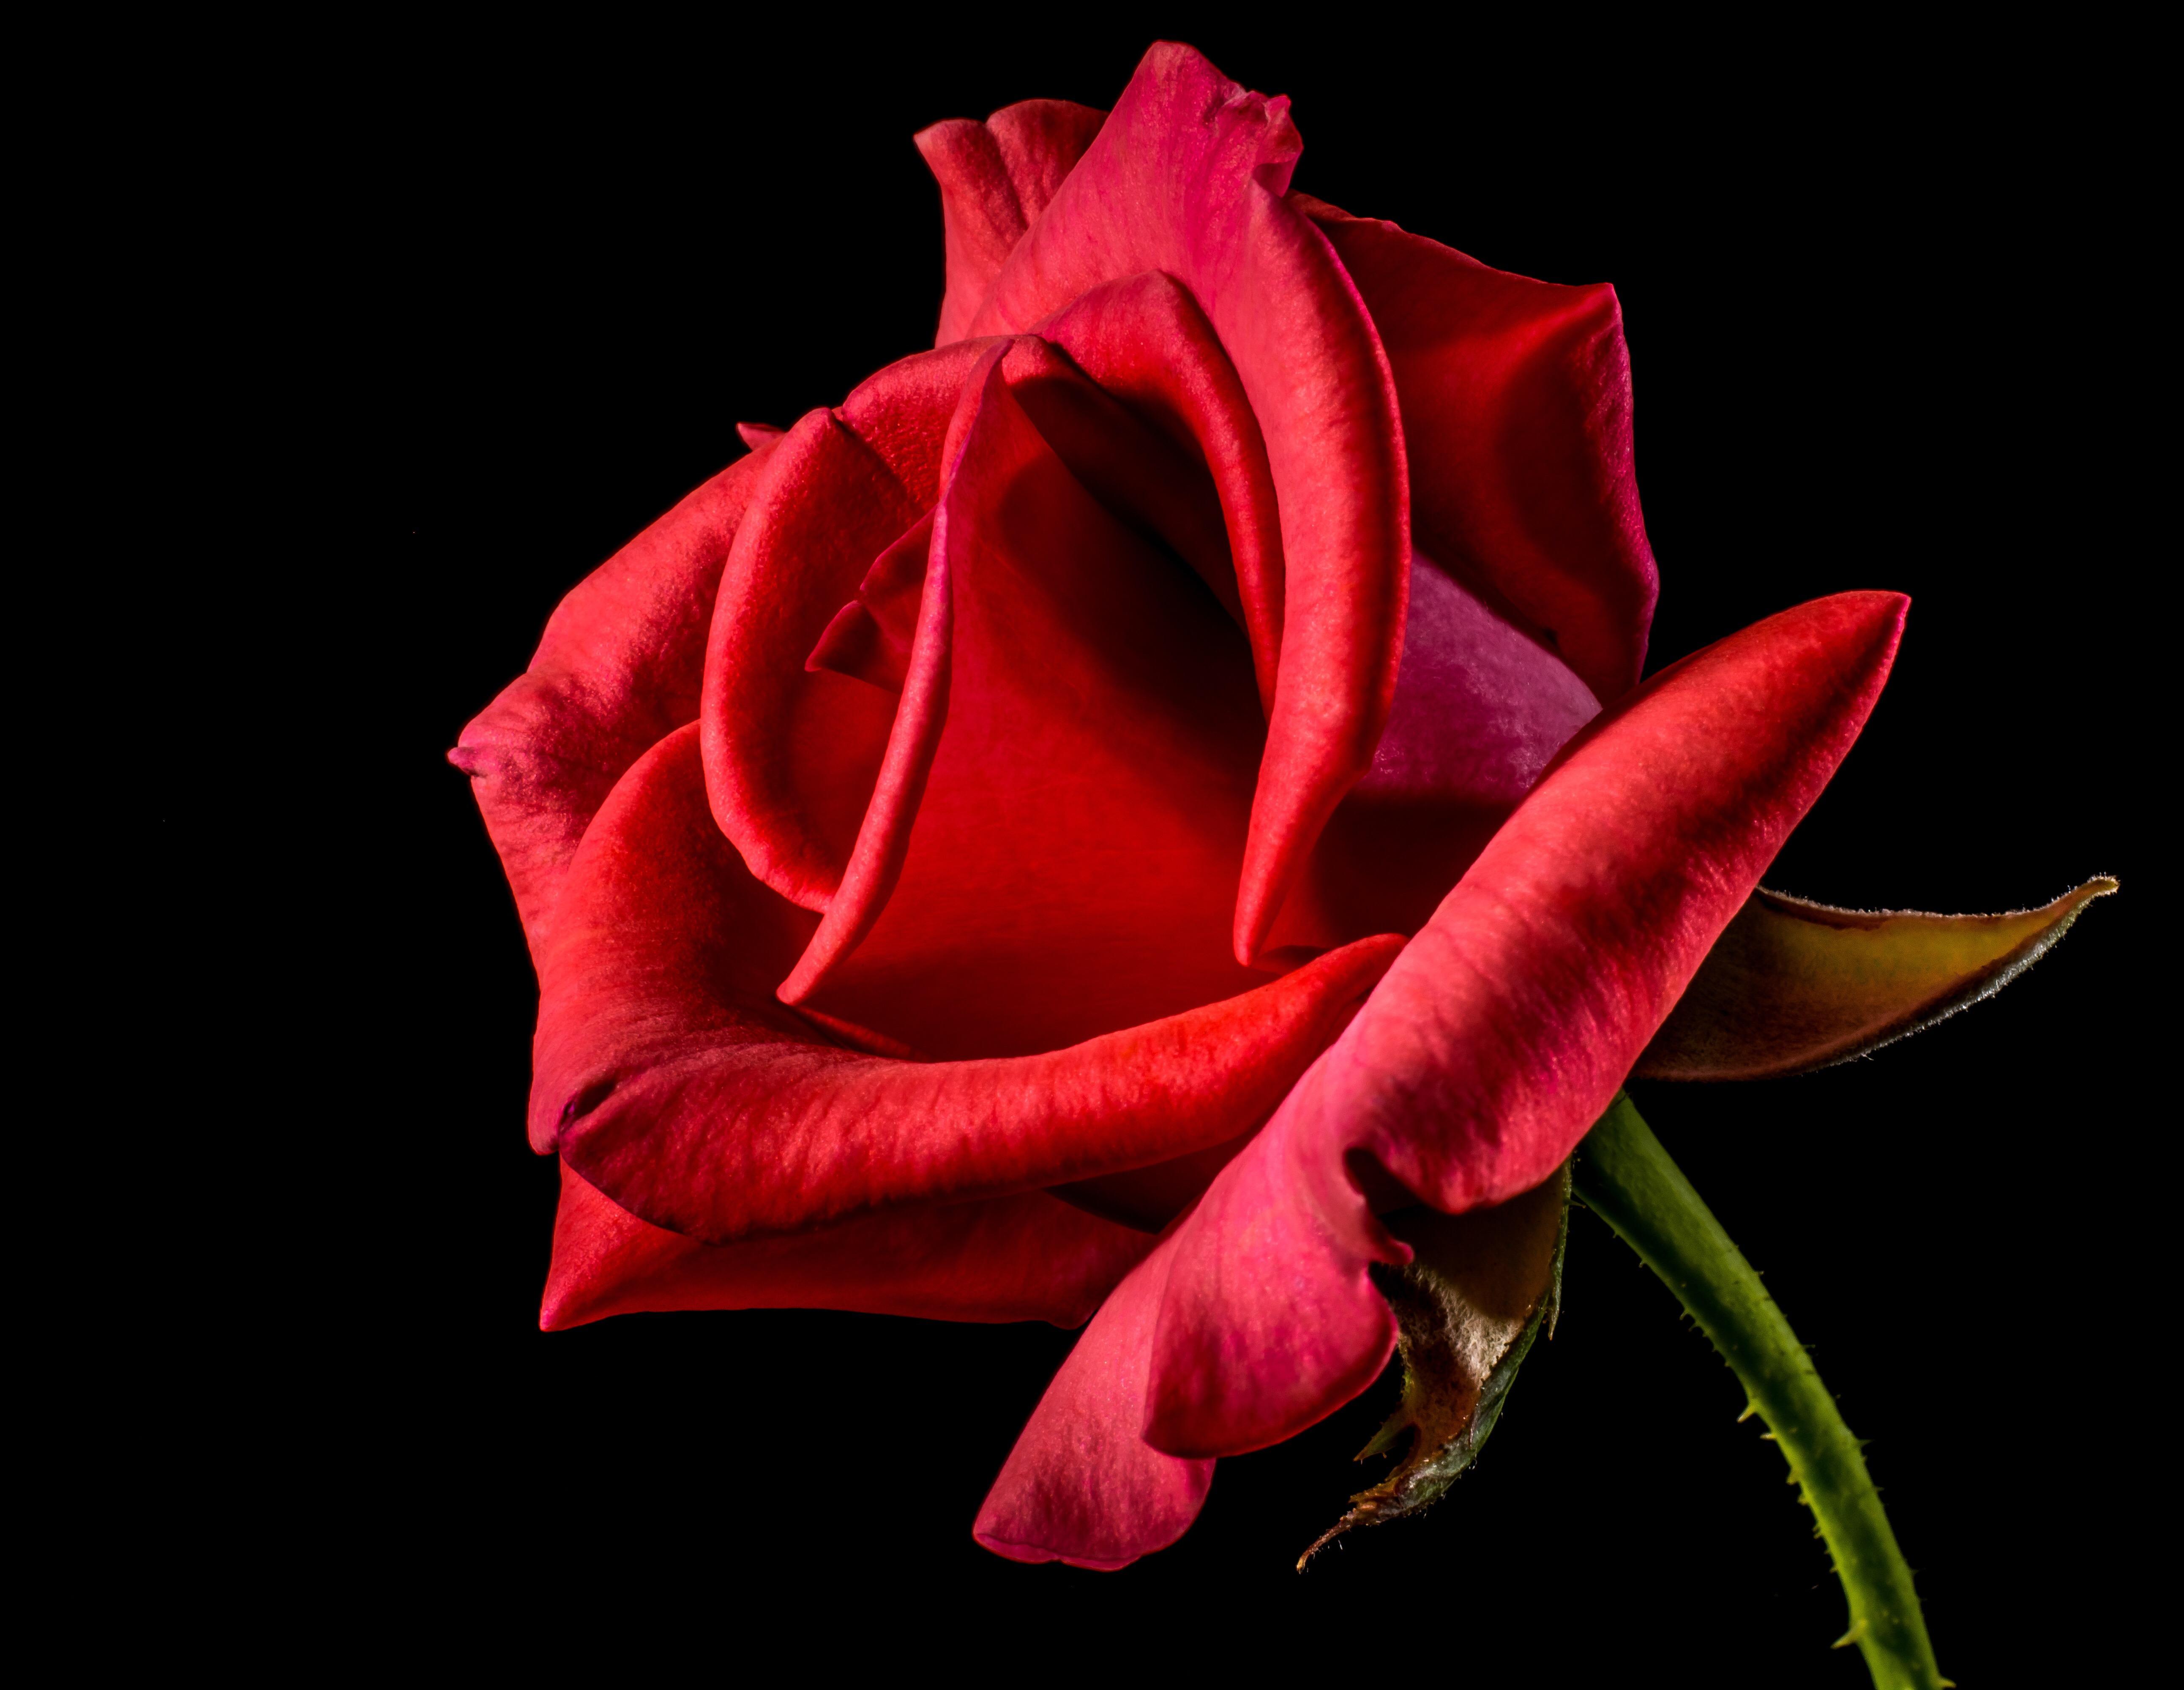 red rose Valentine's Day